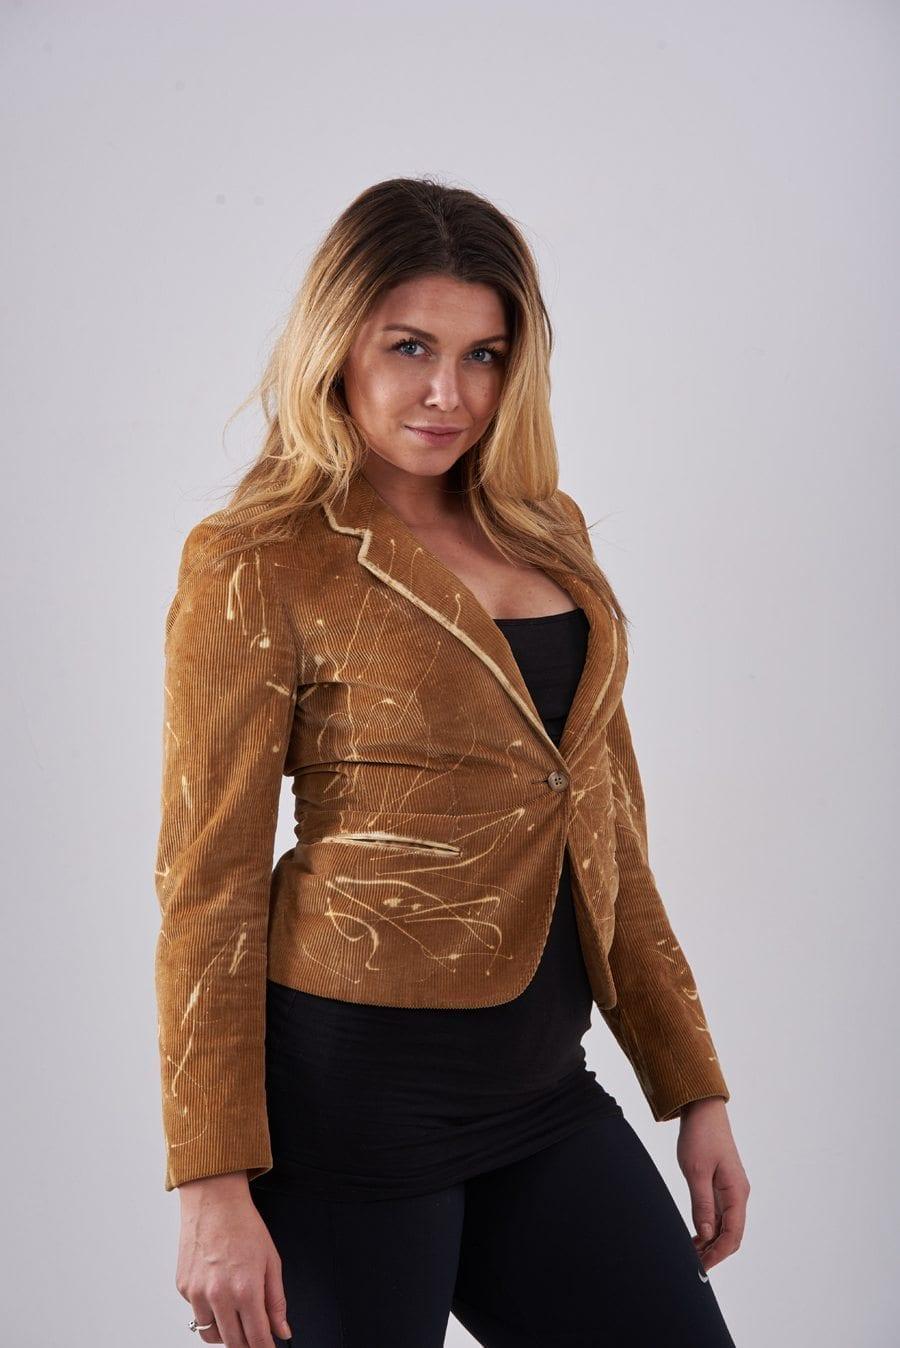 Women's vintage corduroy jacket